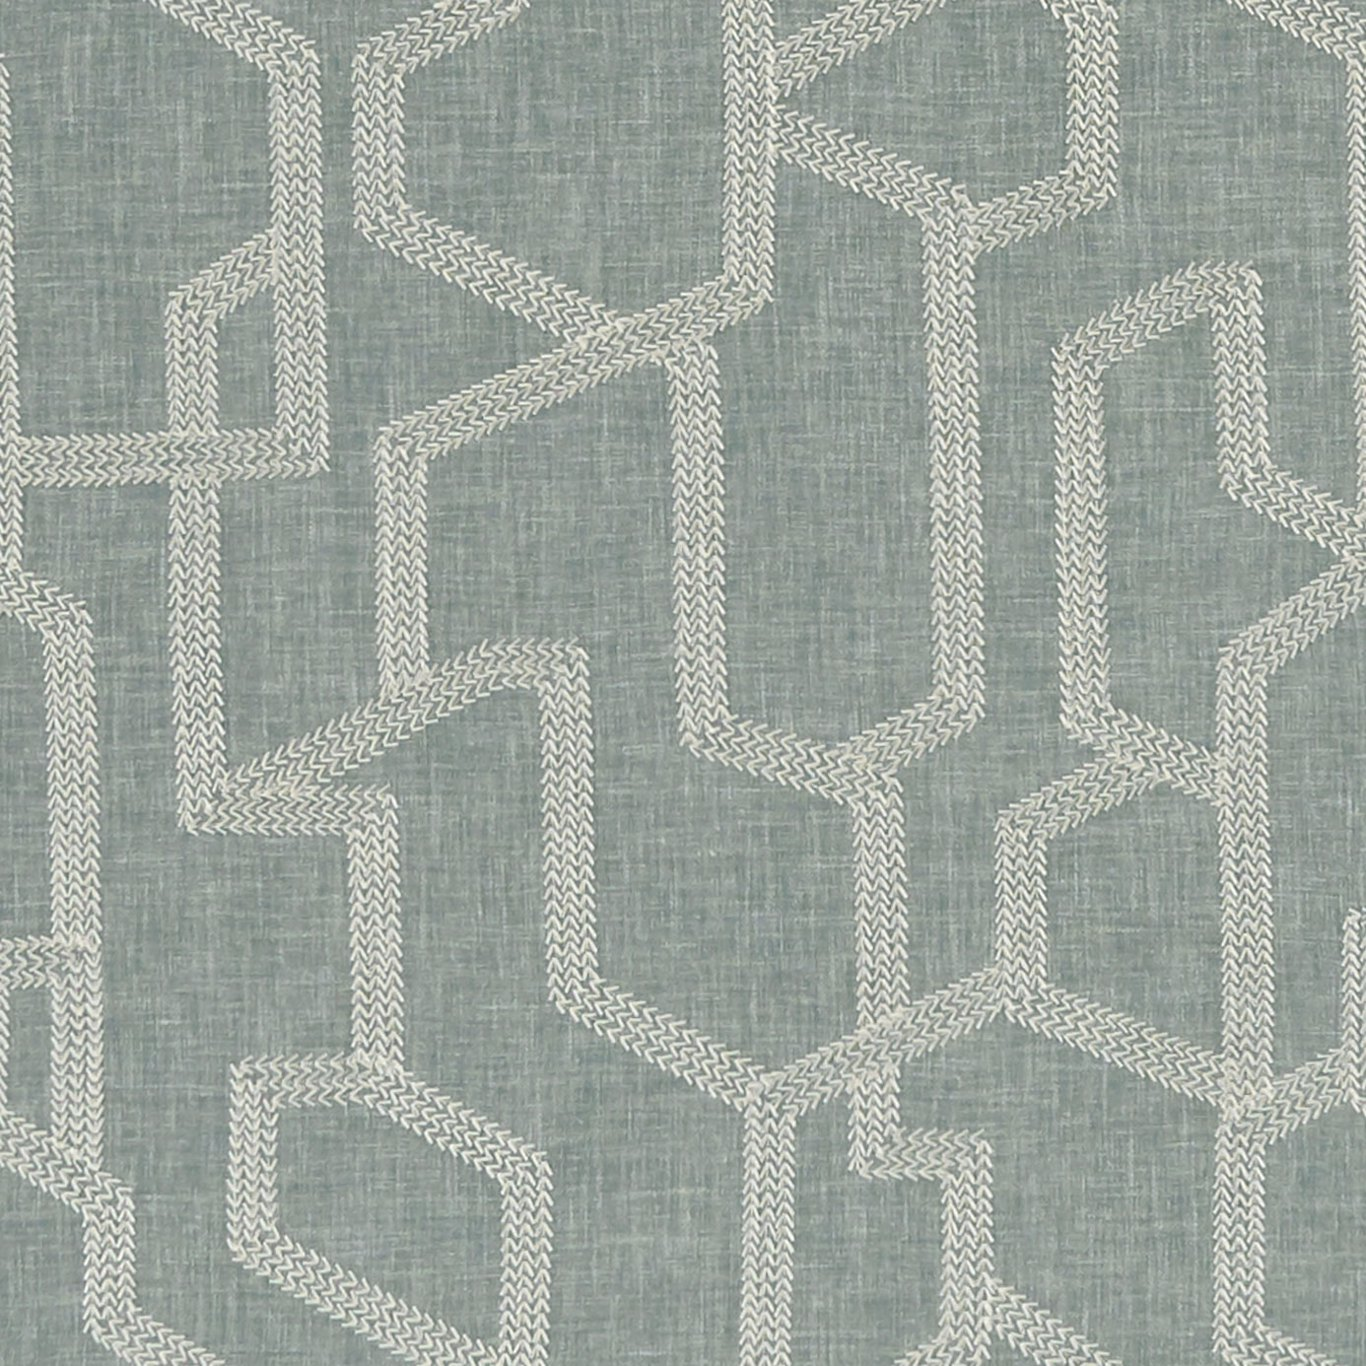 Labyrinth by CNC